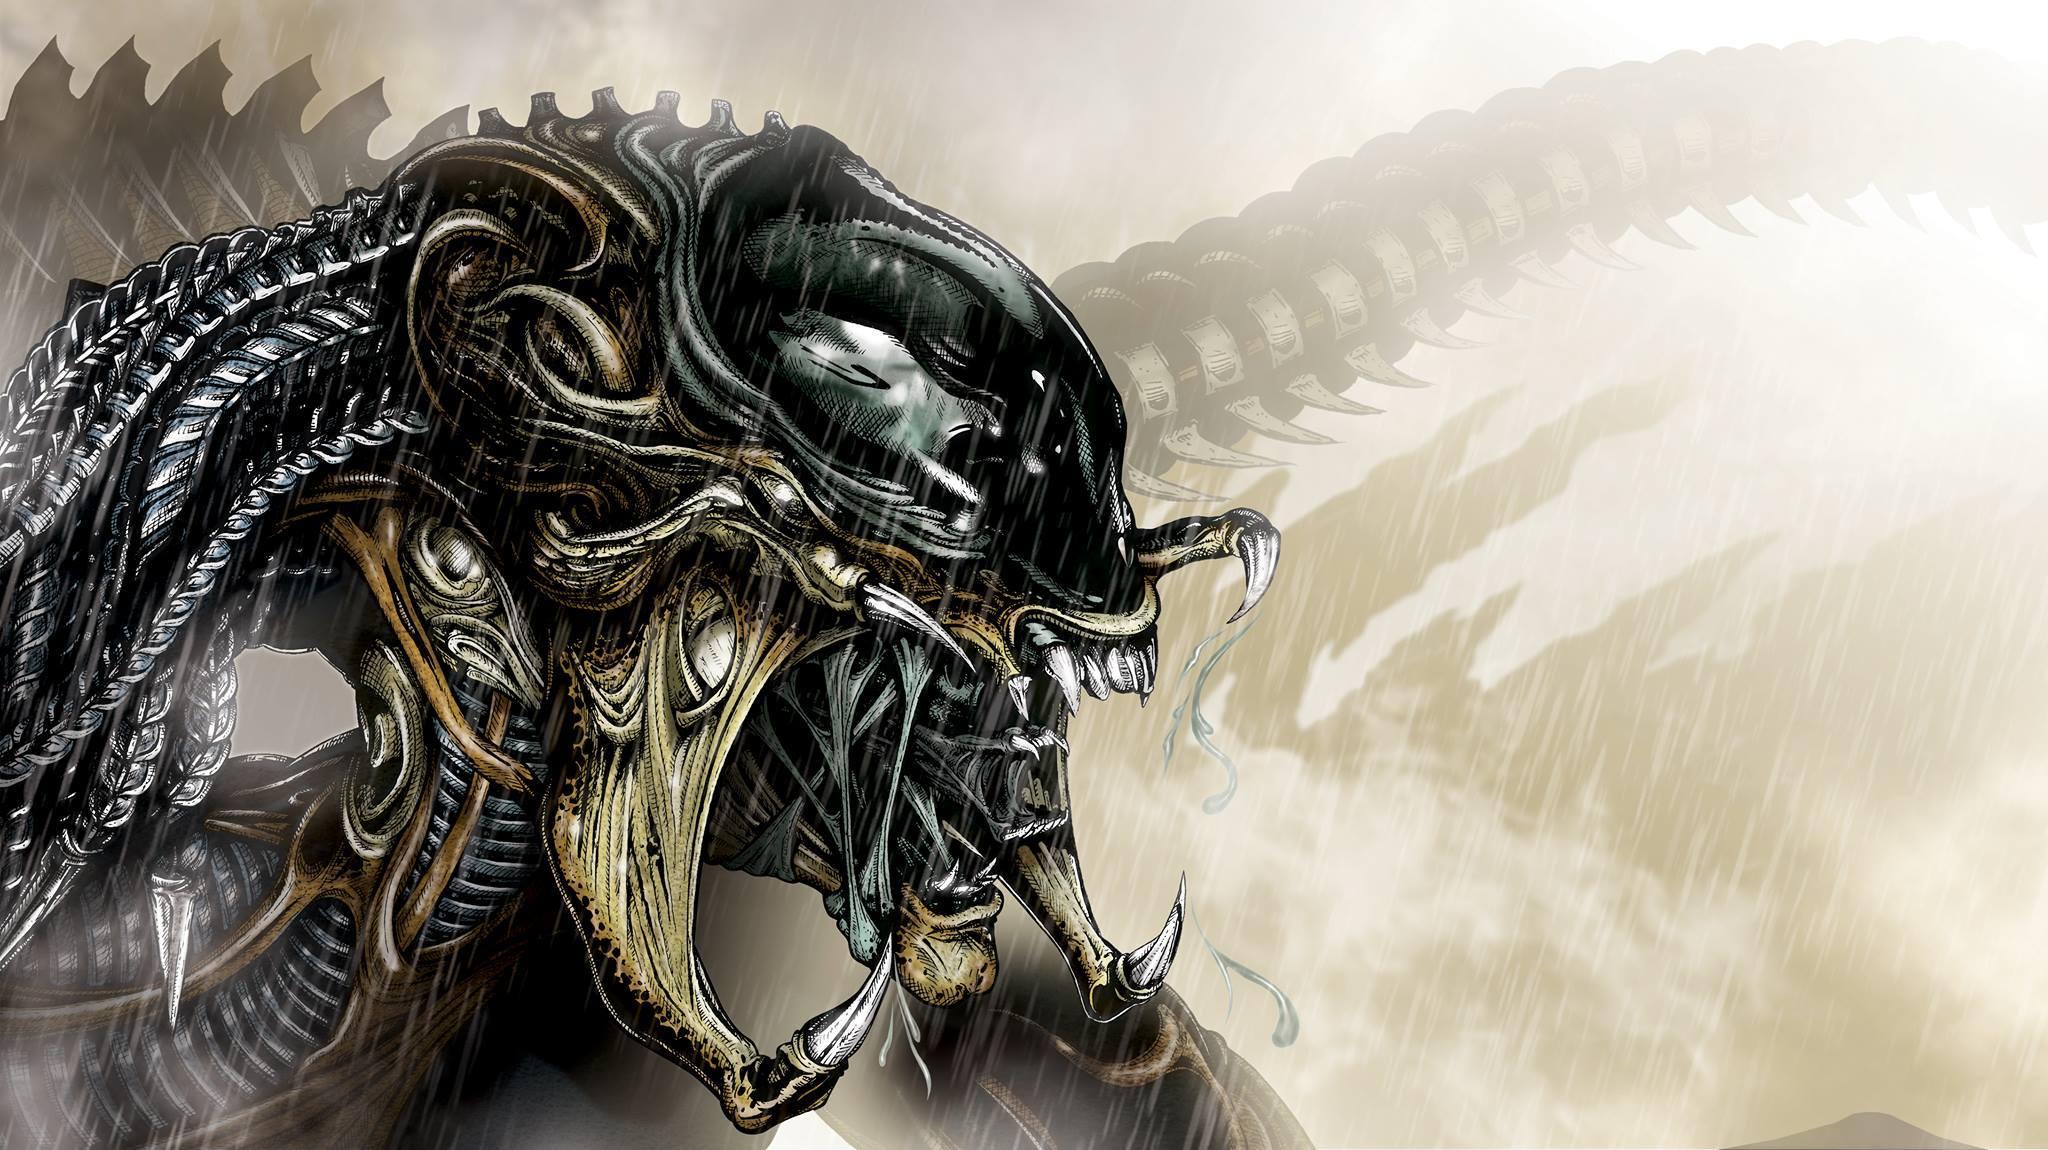 Aliens-vs-Predator-Requiems-wallpaper-wp5004412